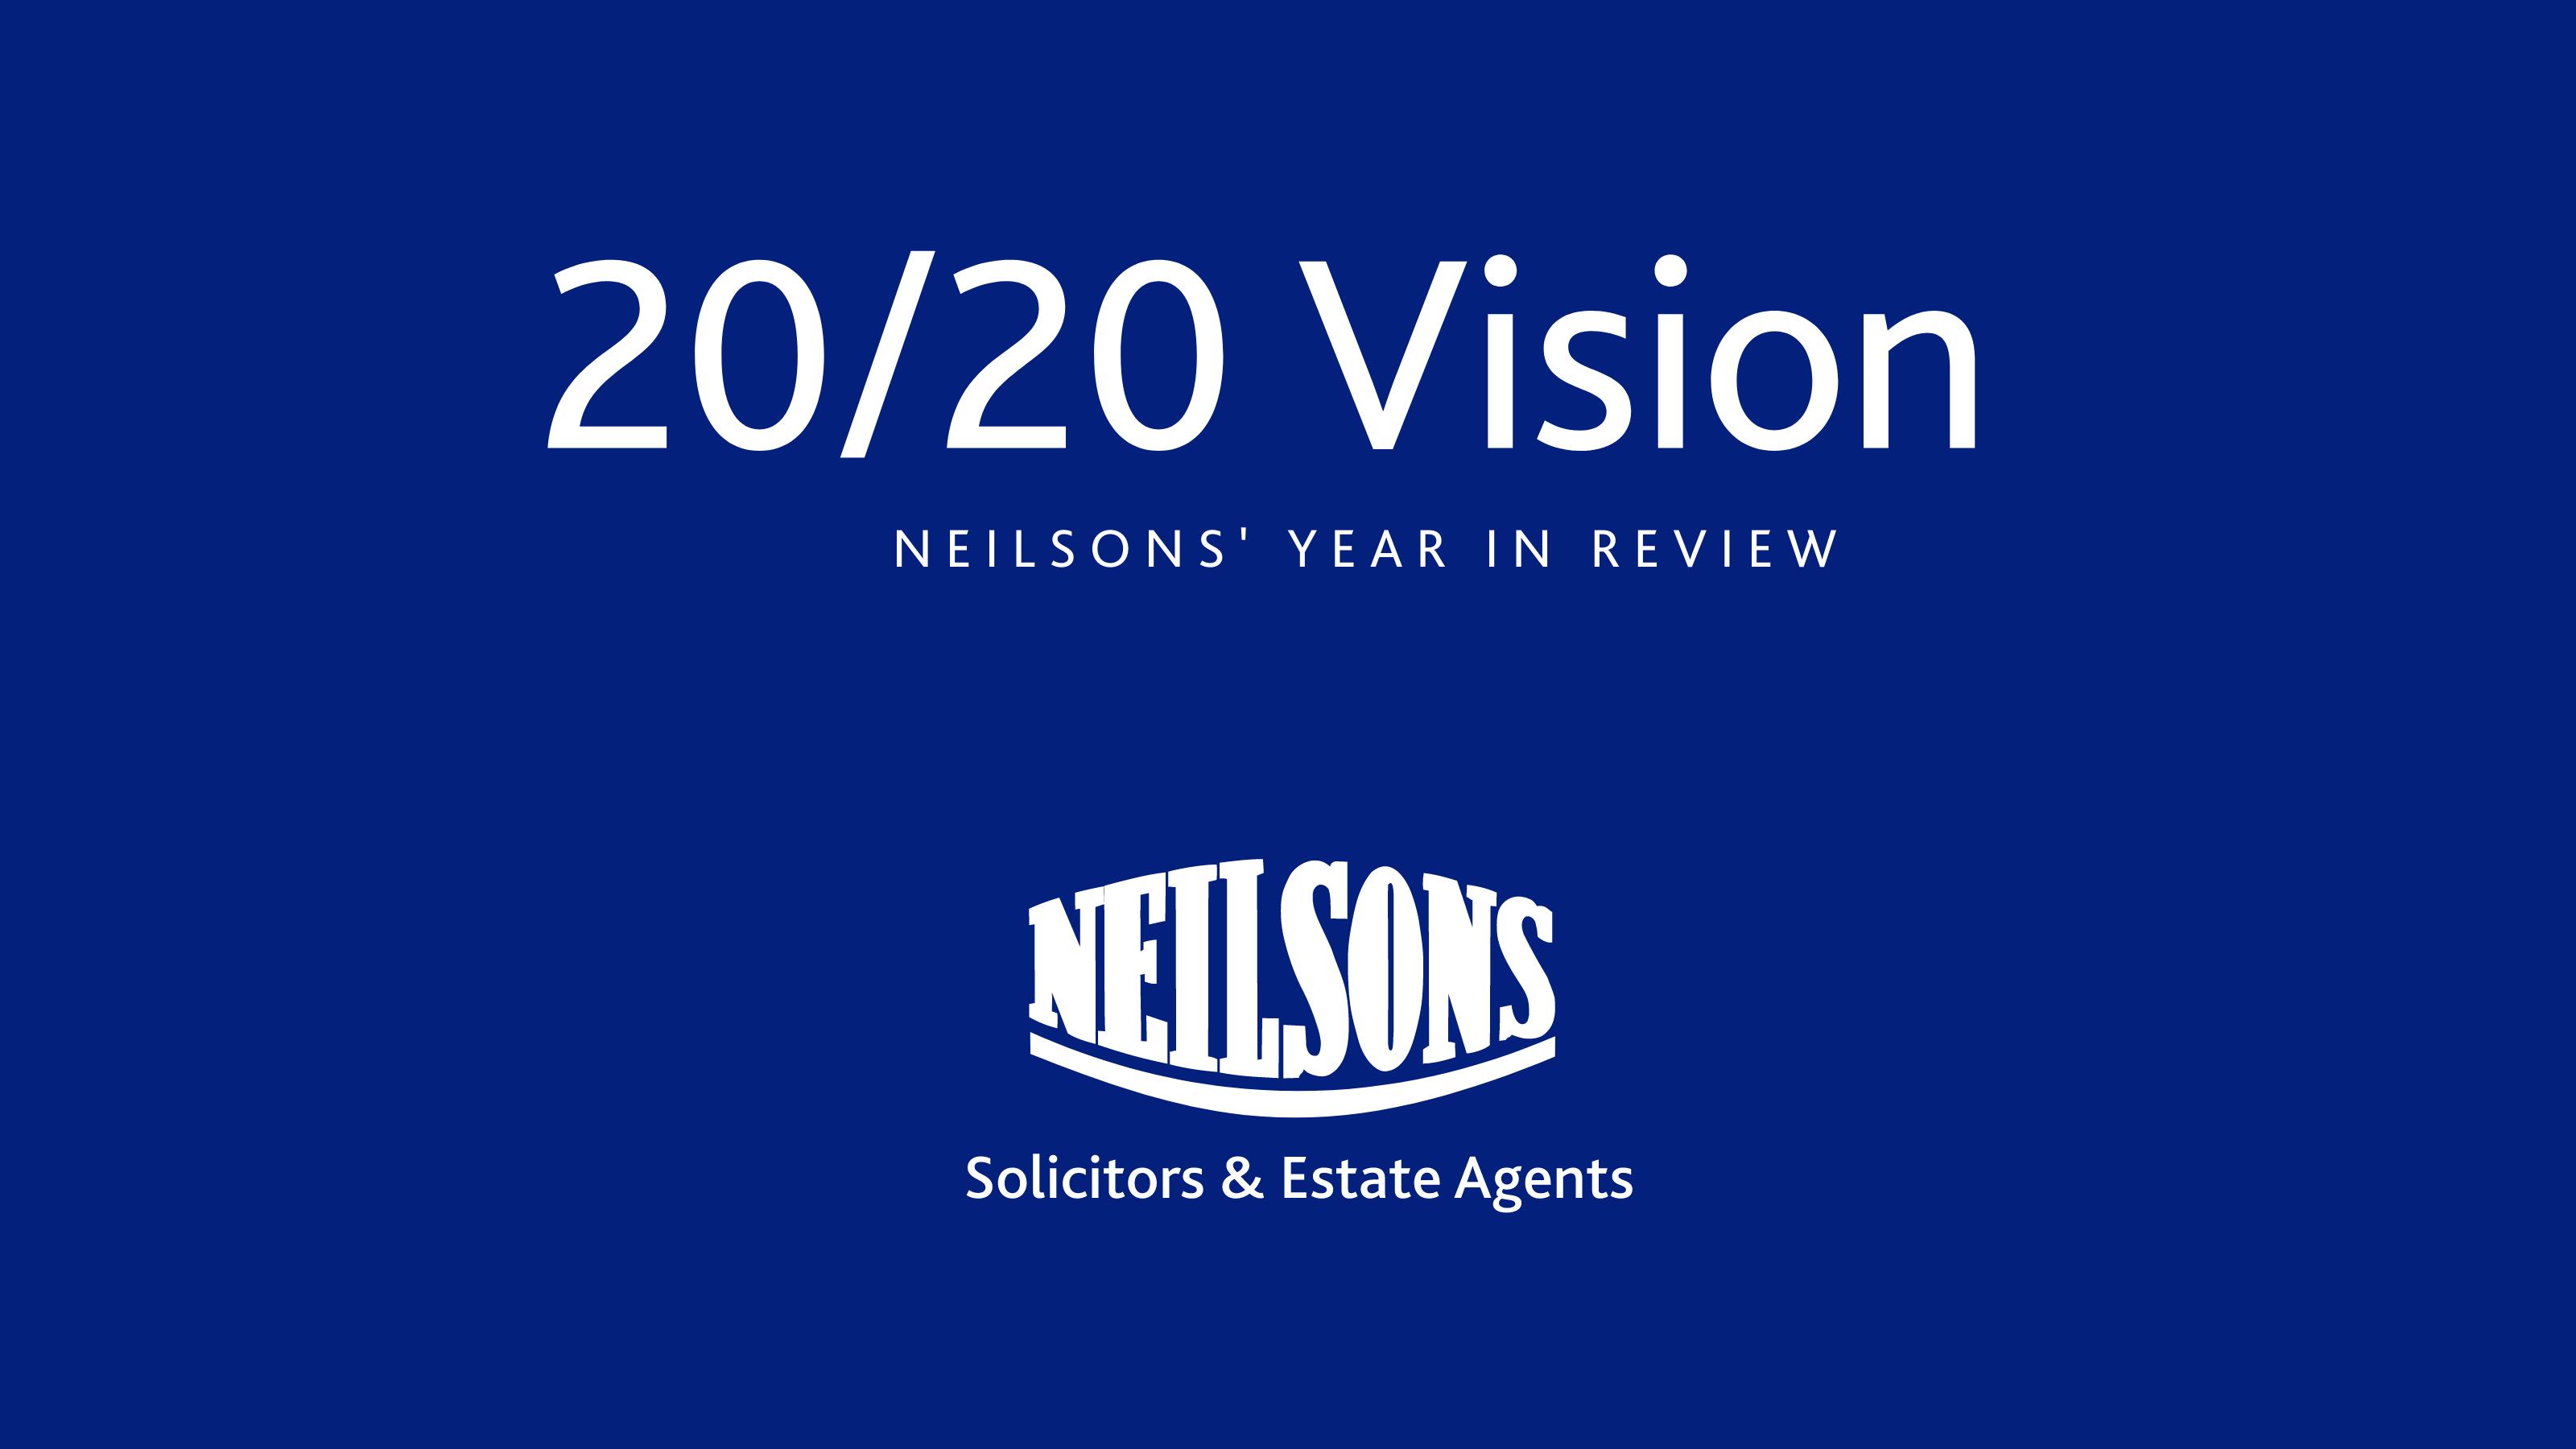 Neilsons 2020